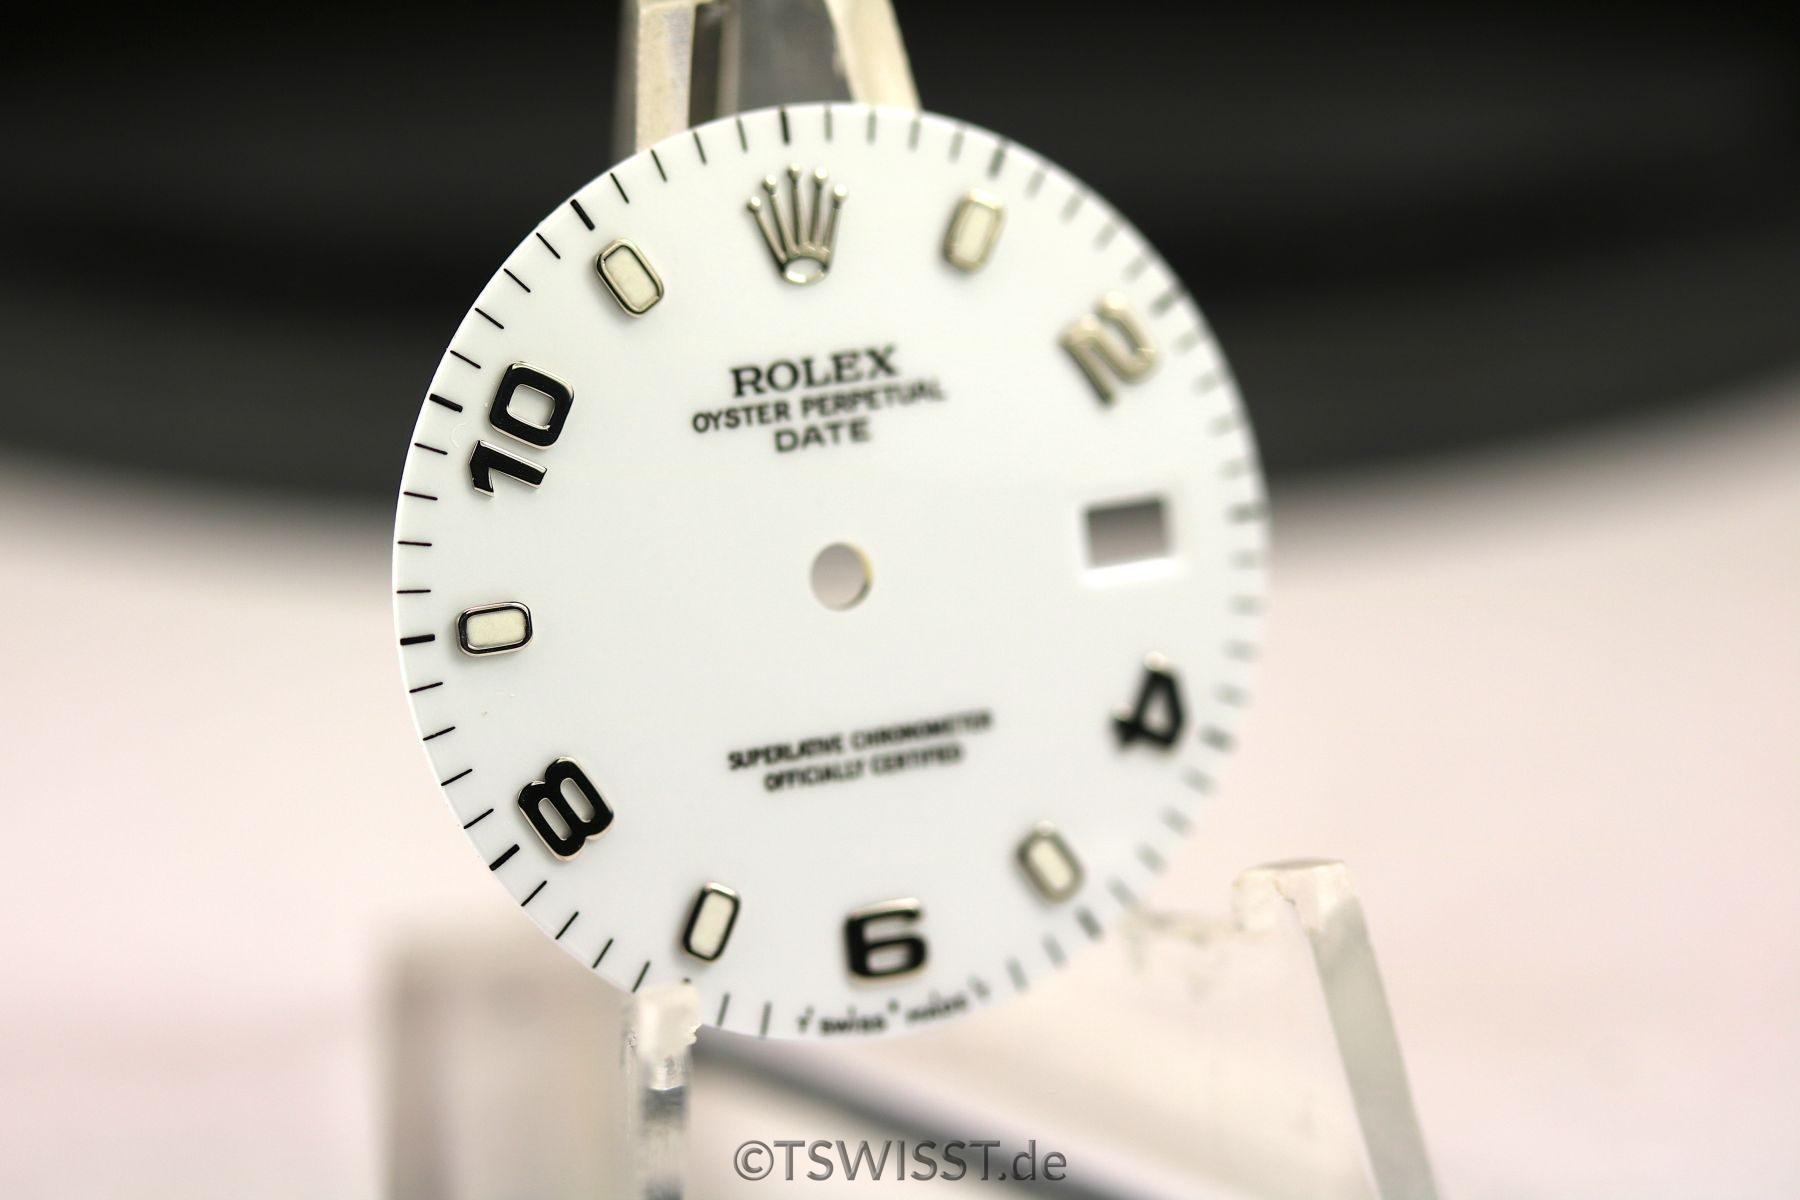 Rolex OP Date dial